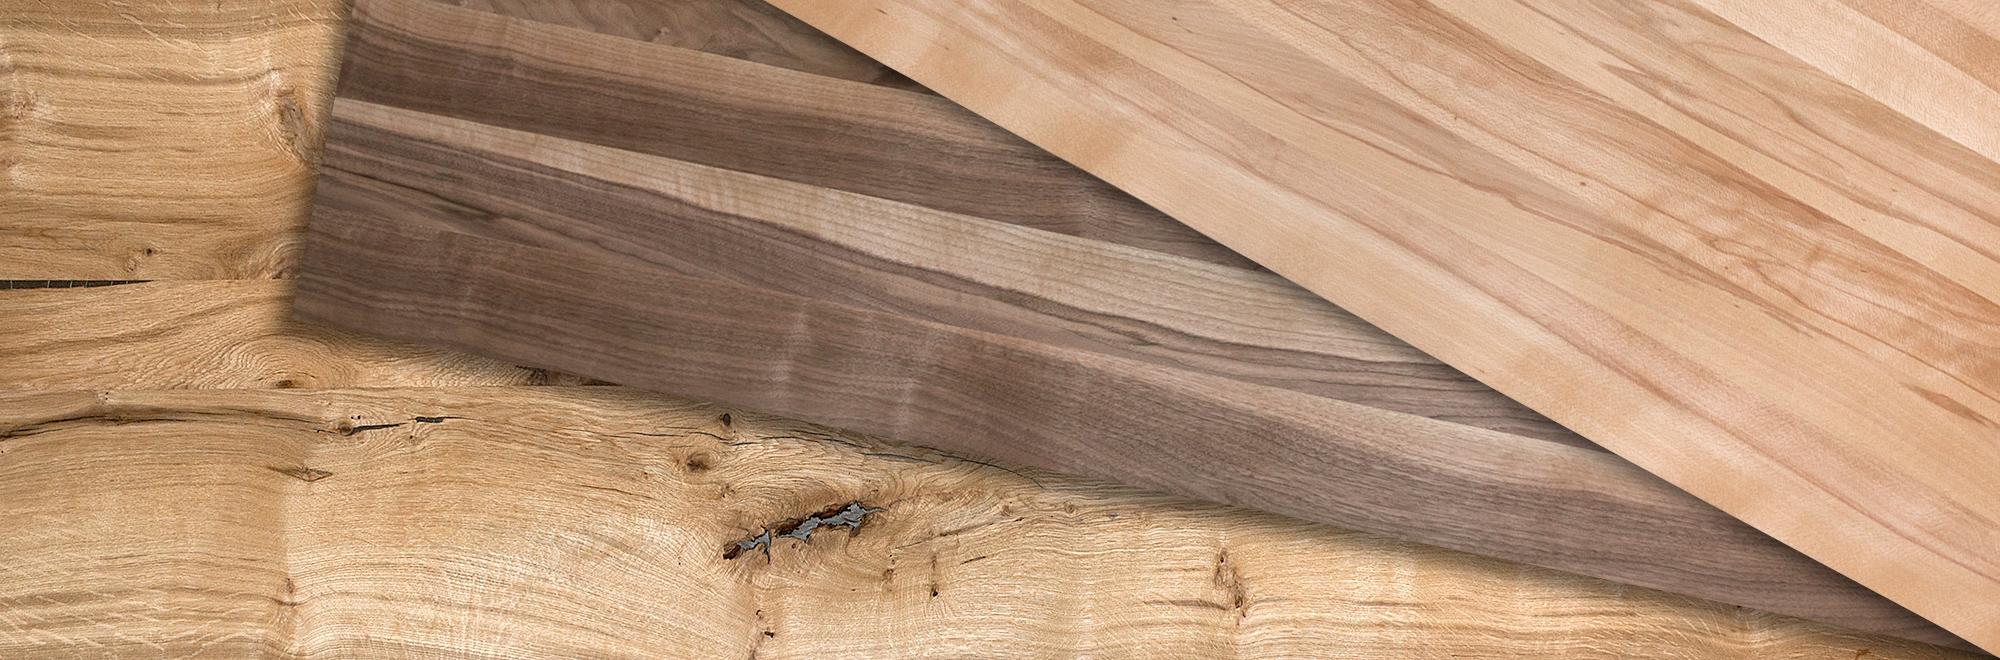 Hwb Furniere Holzwerkstoffe